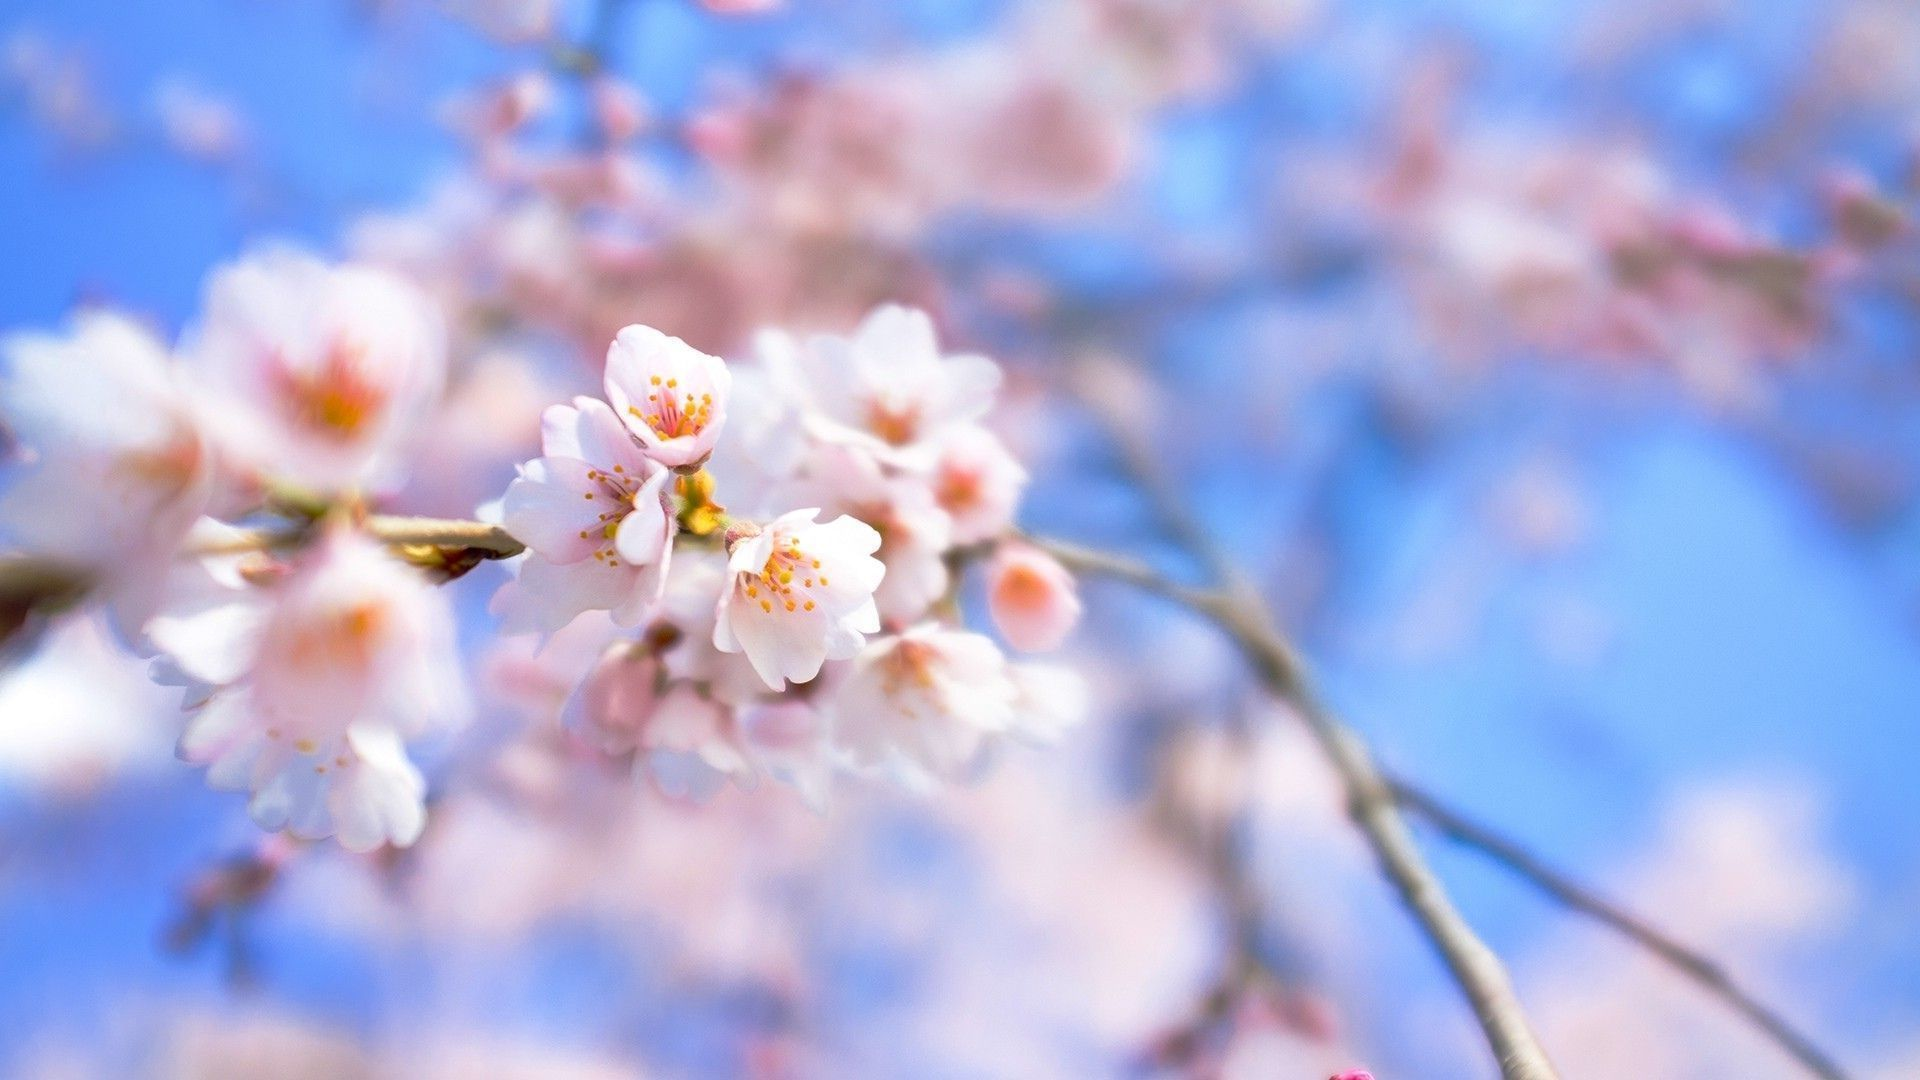 Beautiful Cherry Blossom Desktop Wallpapers Jpg 1920 1080